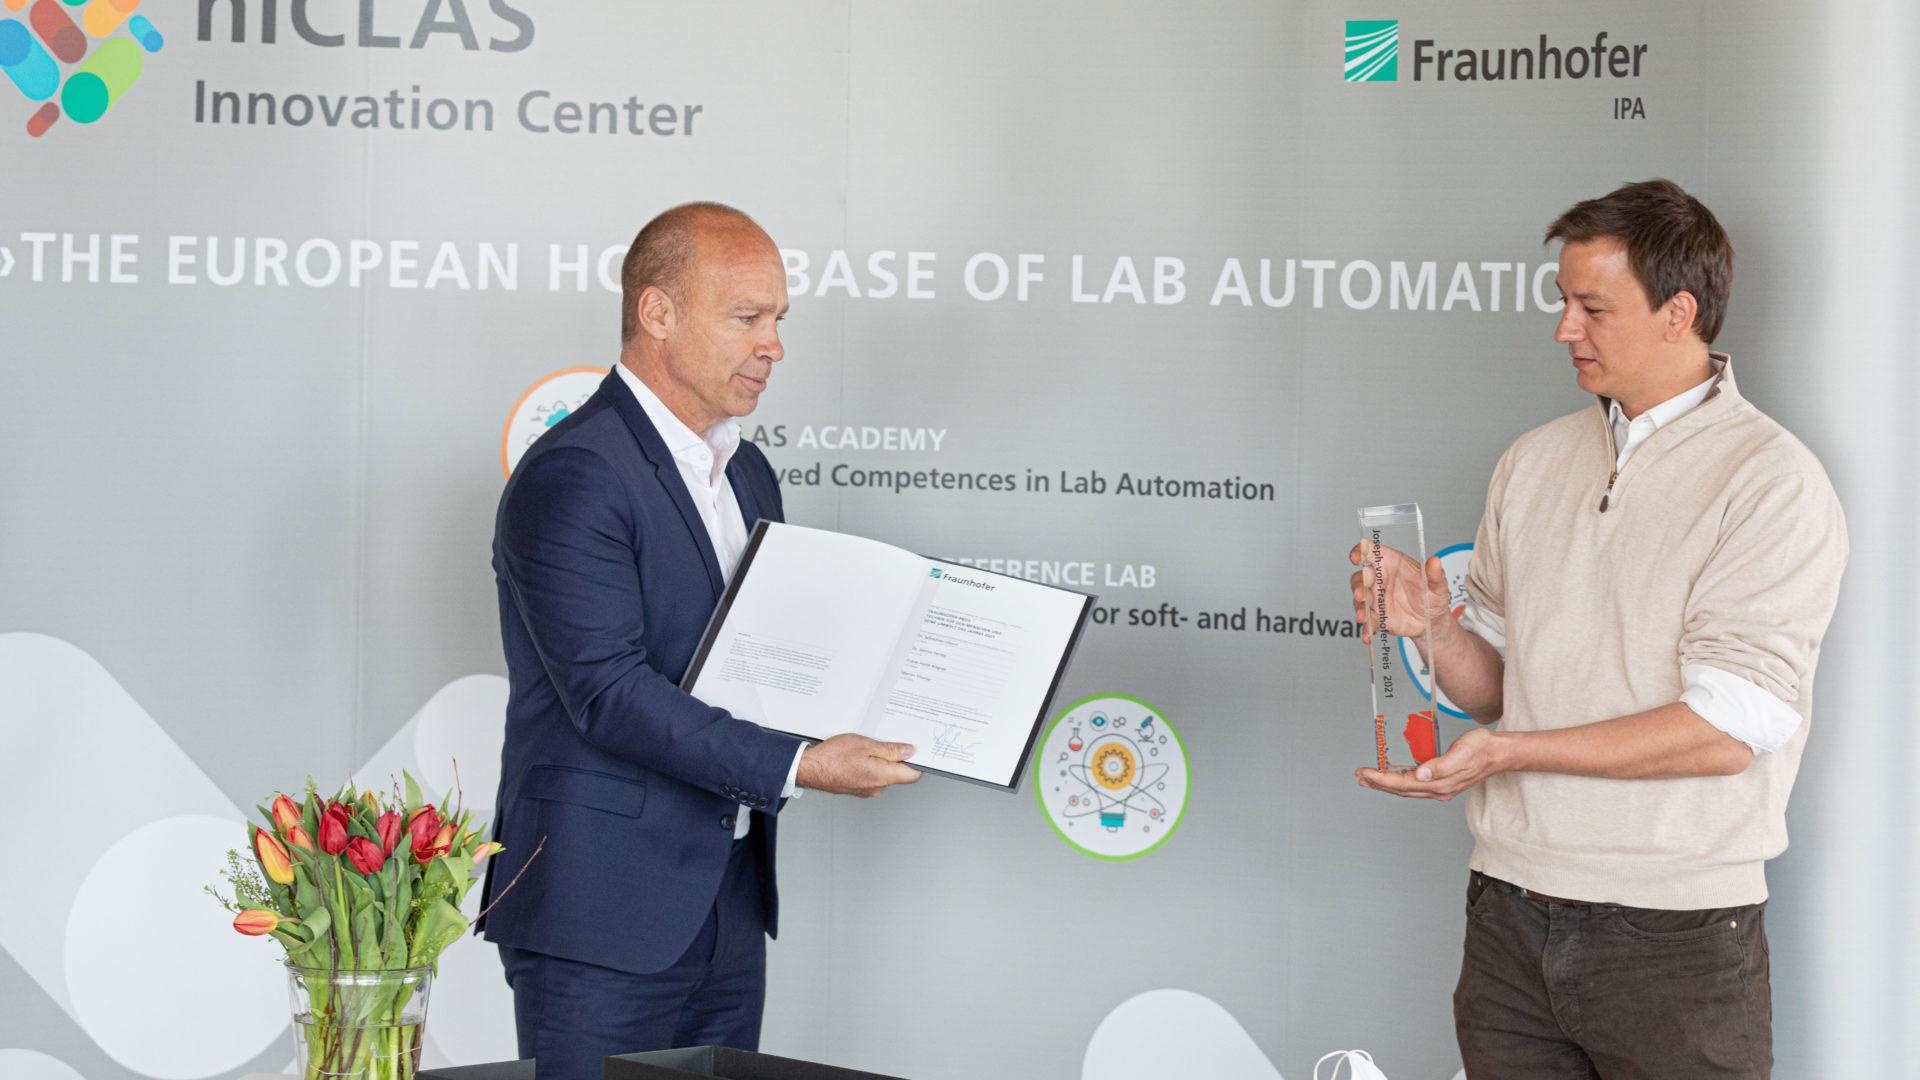 Martin Thoma erhält Fraunhofer-Preis